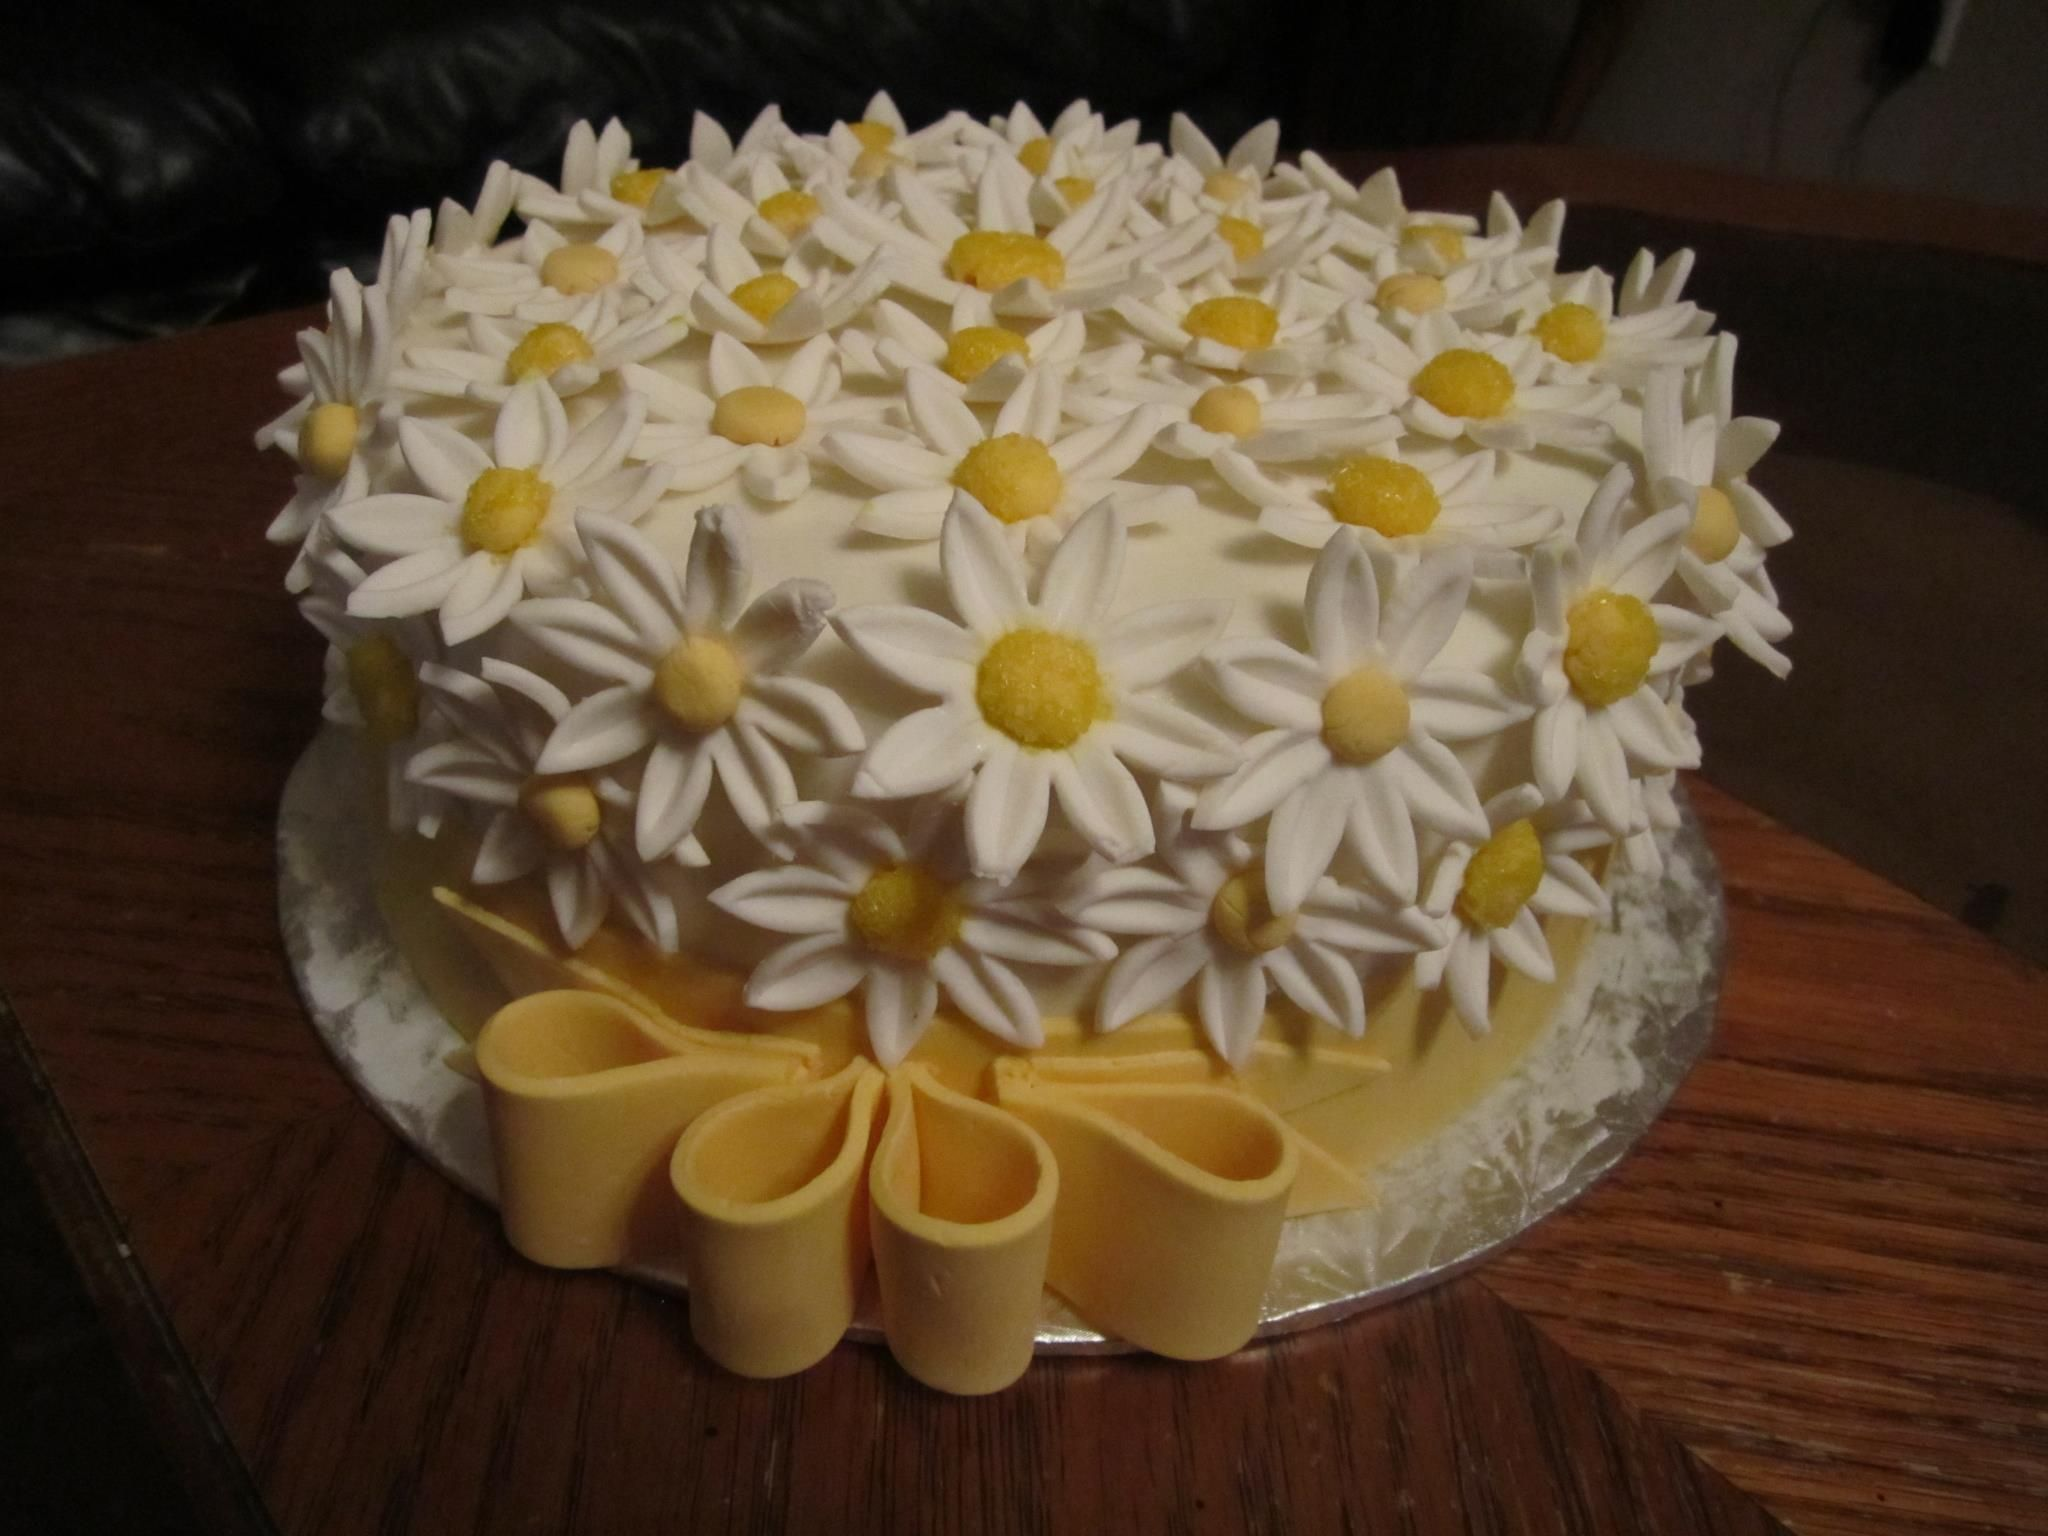 Peachy Daisy Birthday Cake Con Imagenes Tortas Pasteles Mini Pasteles Funny Birthday Cards Online Elaedamsfinfo